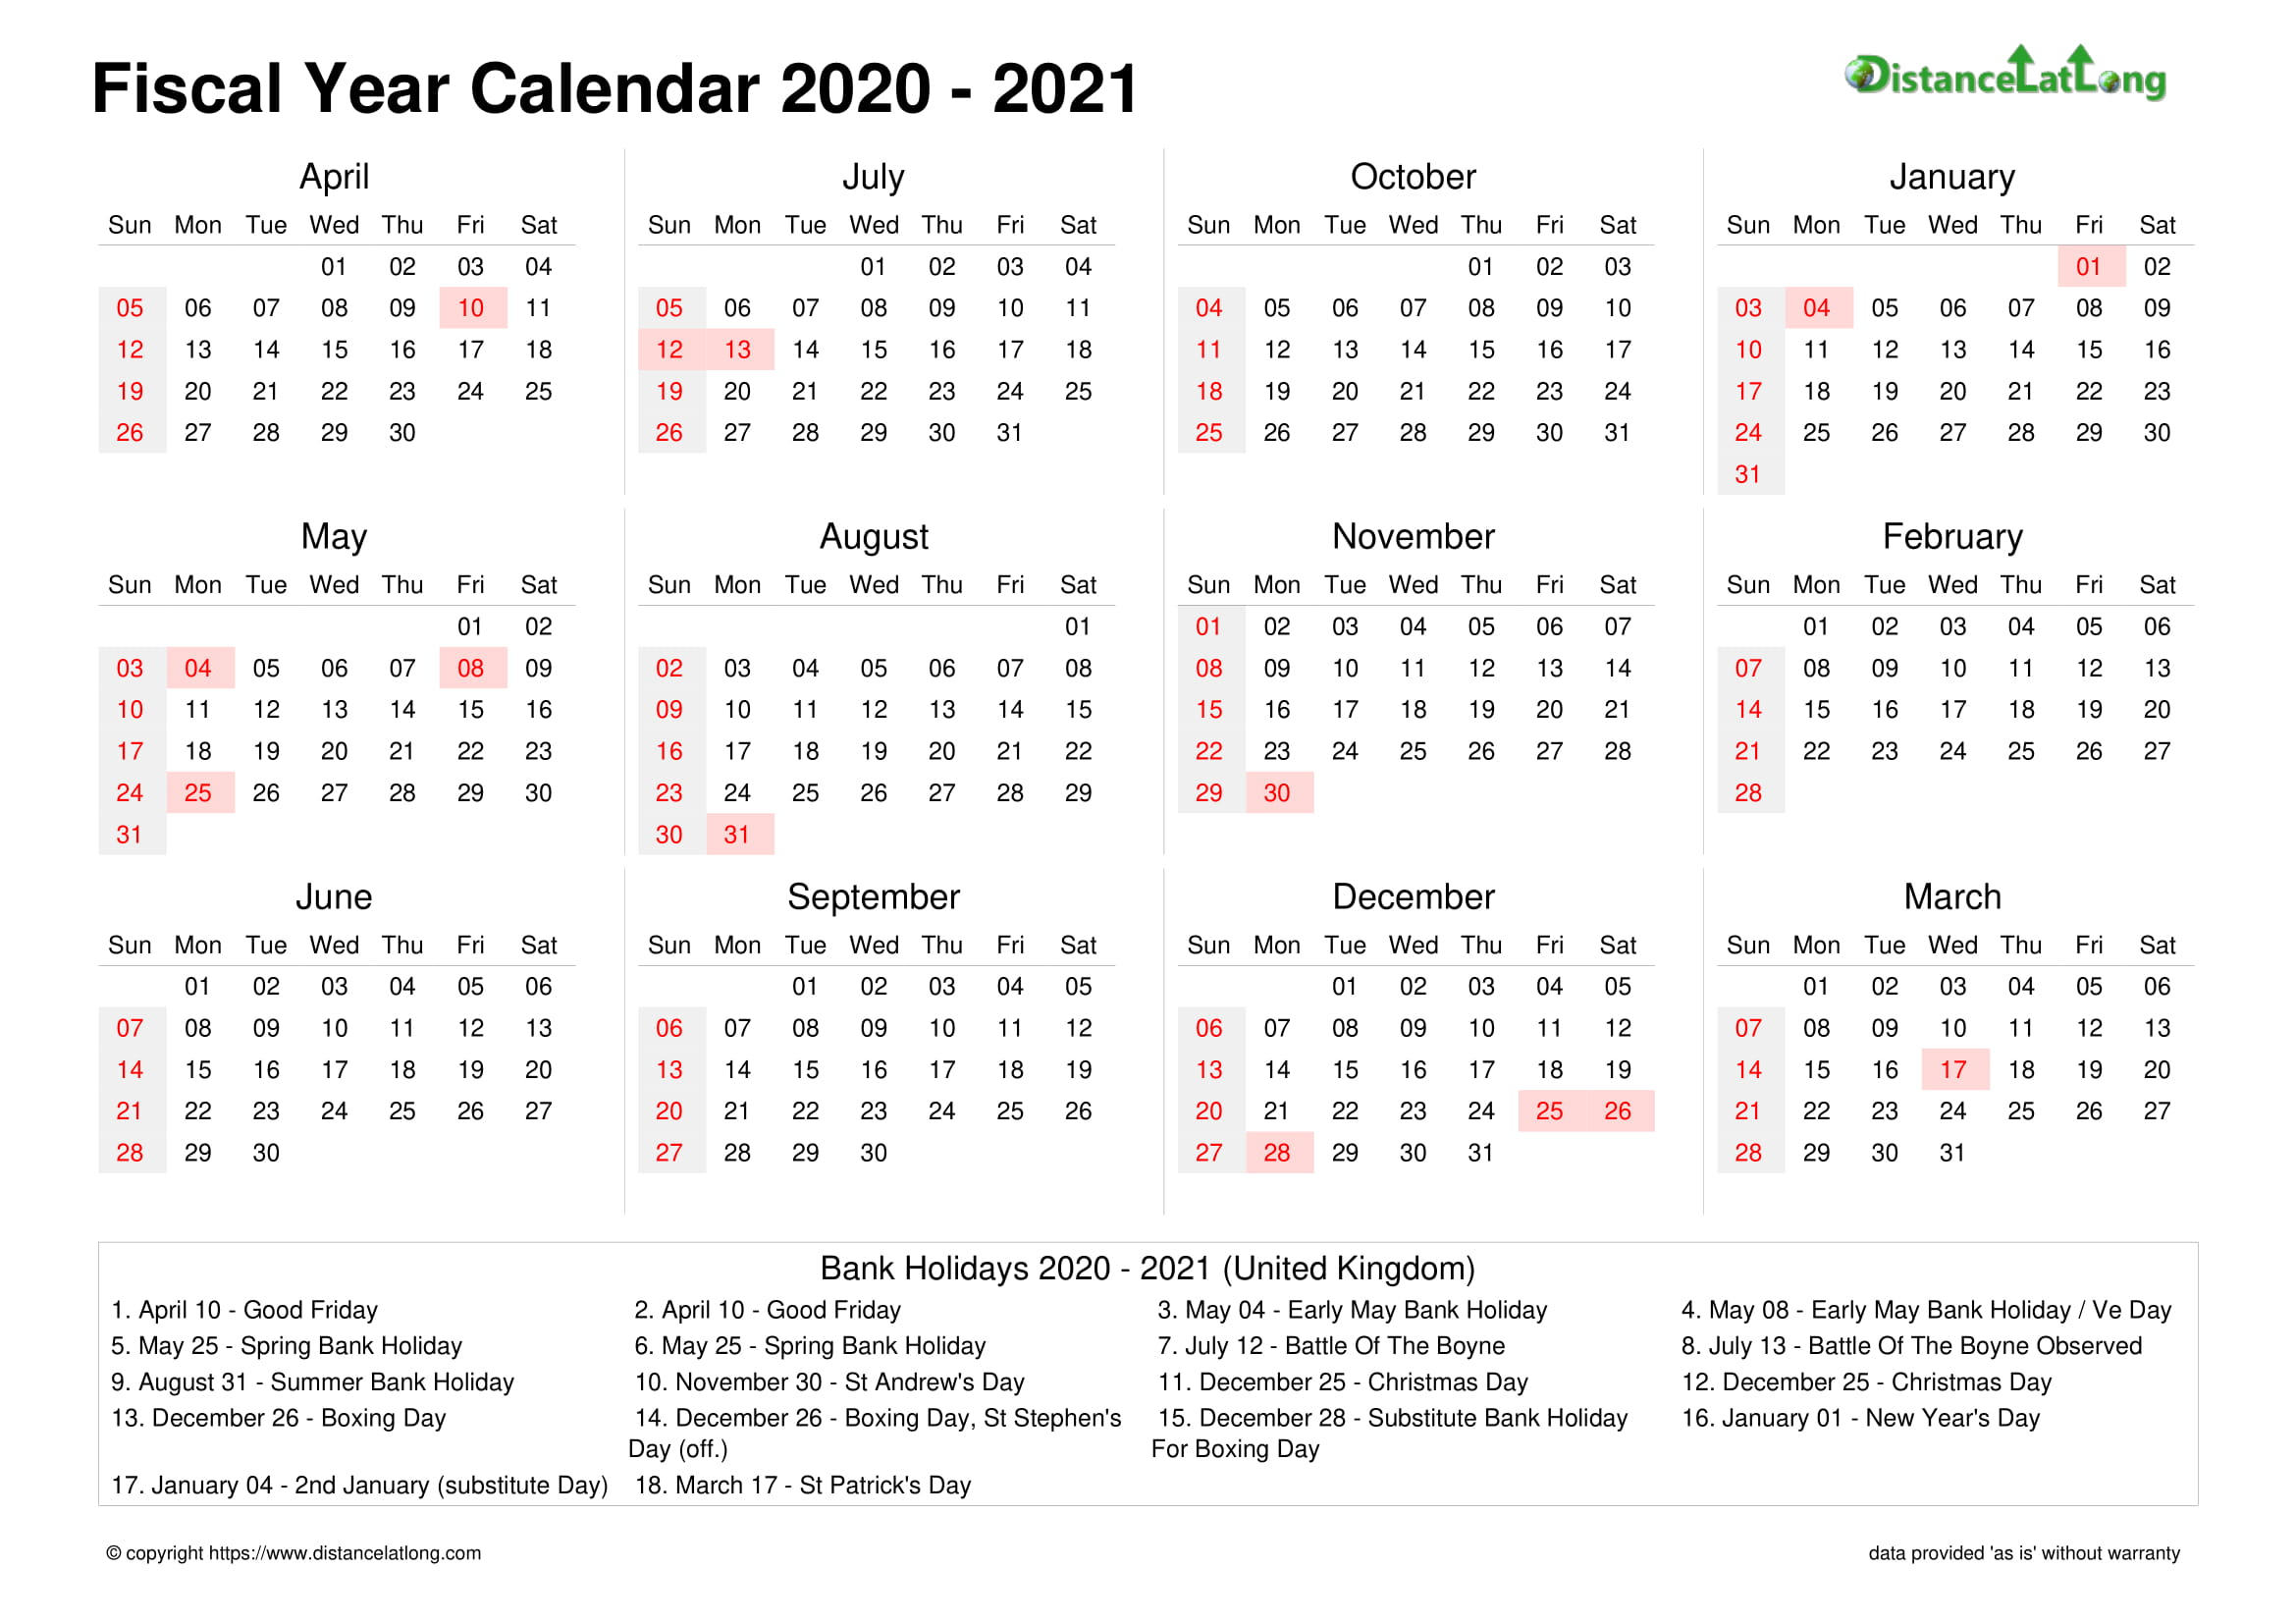 2021 Holiday Calendar Landscape Orientation Free Printable Templates Free Download Distancelatlong Com